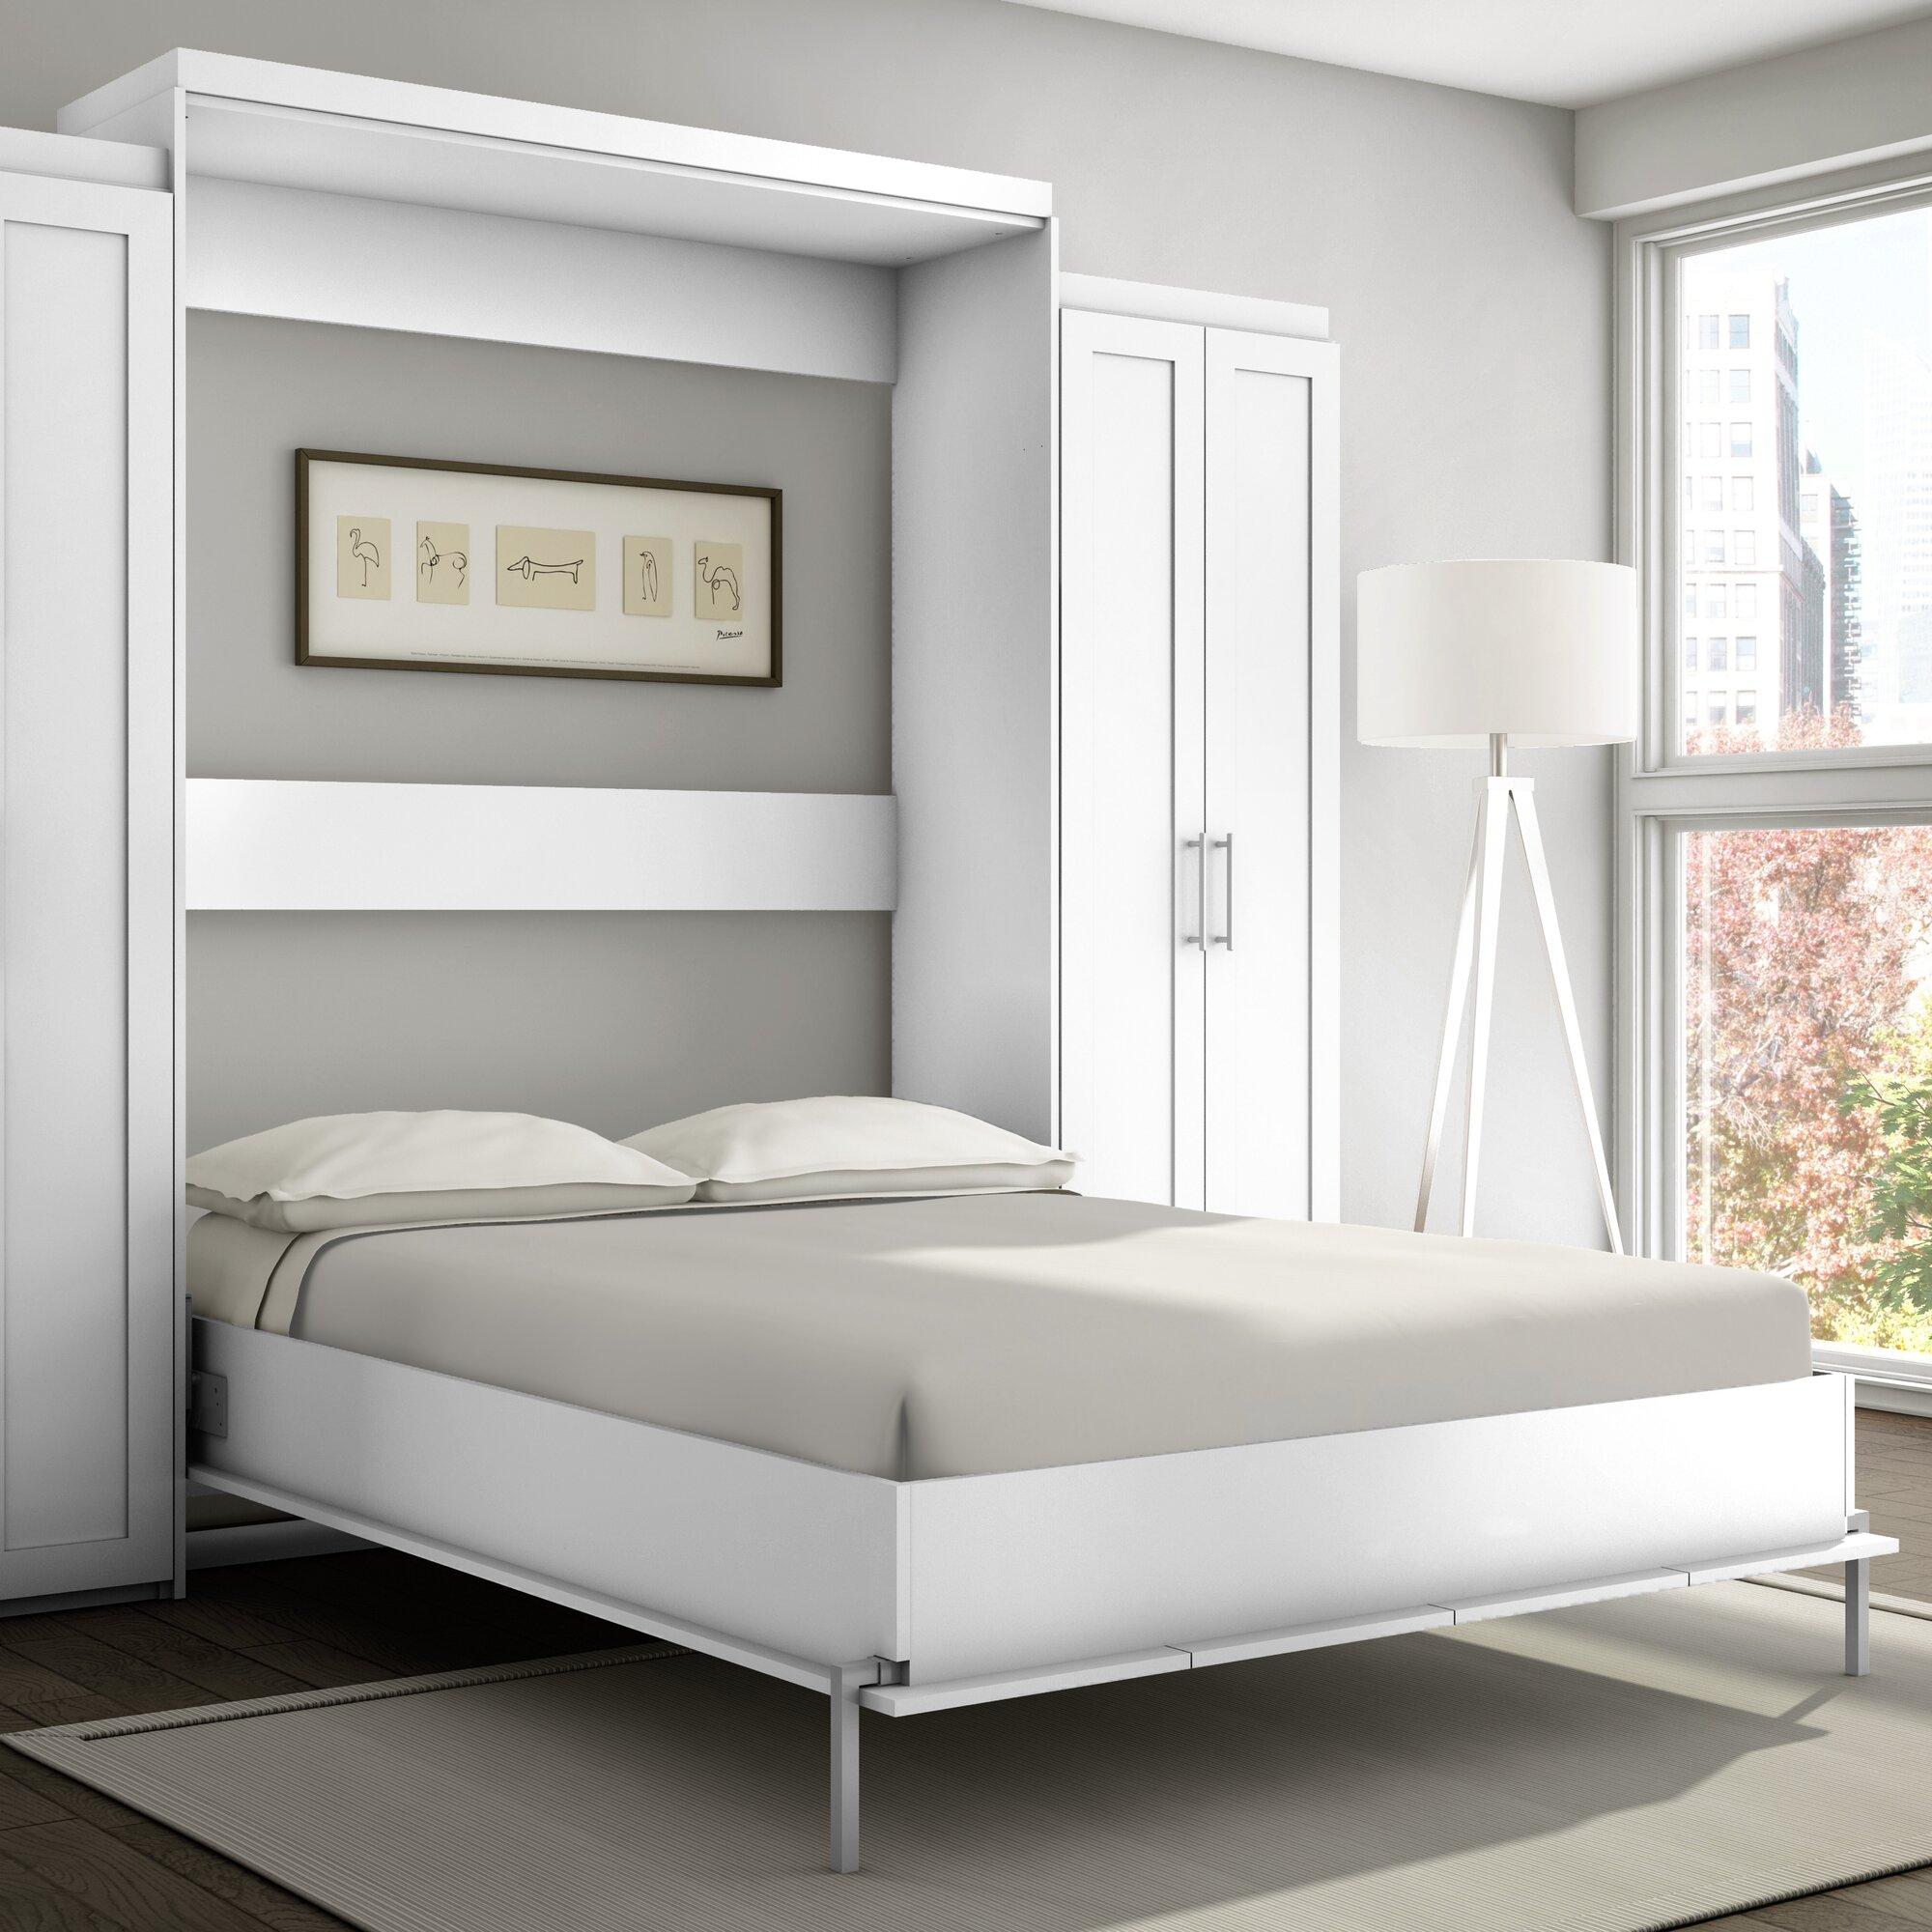 Stellar Home Shaker Murphy Bed  Reviews Wayfair - Online shaker style bedroom furniture